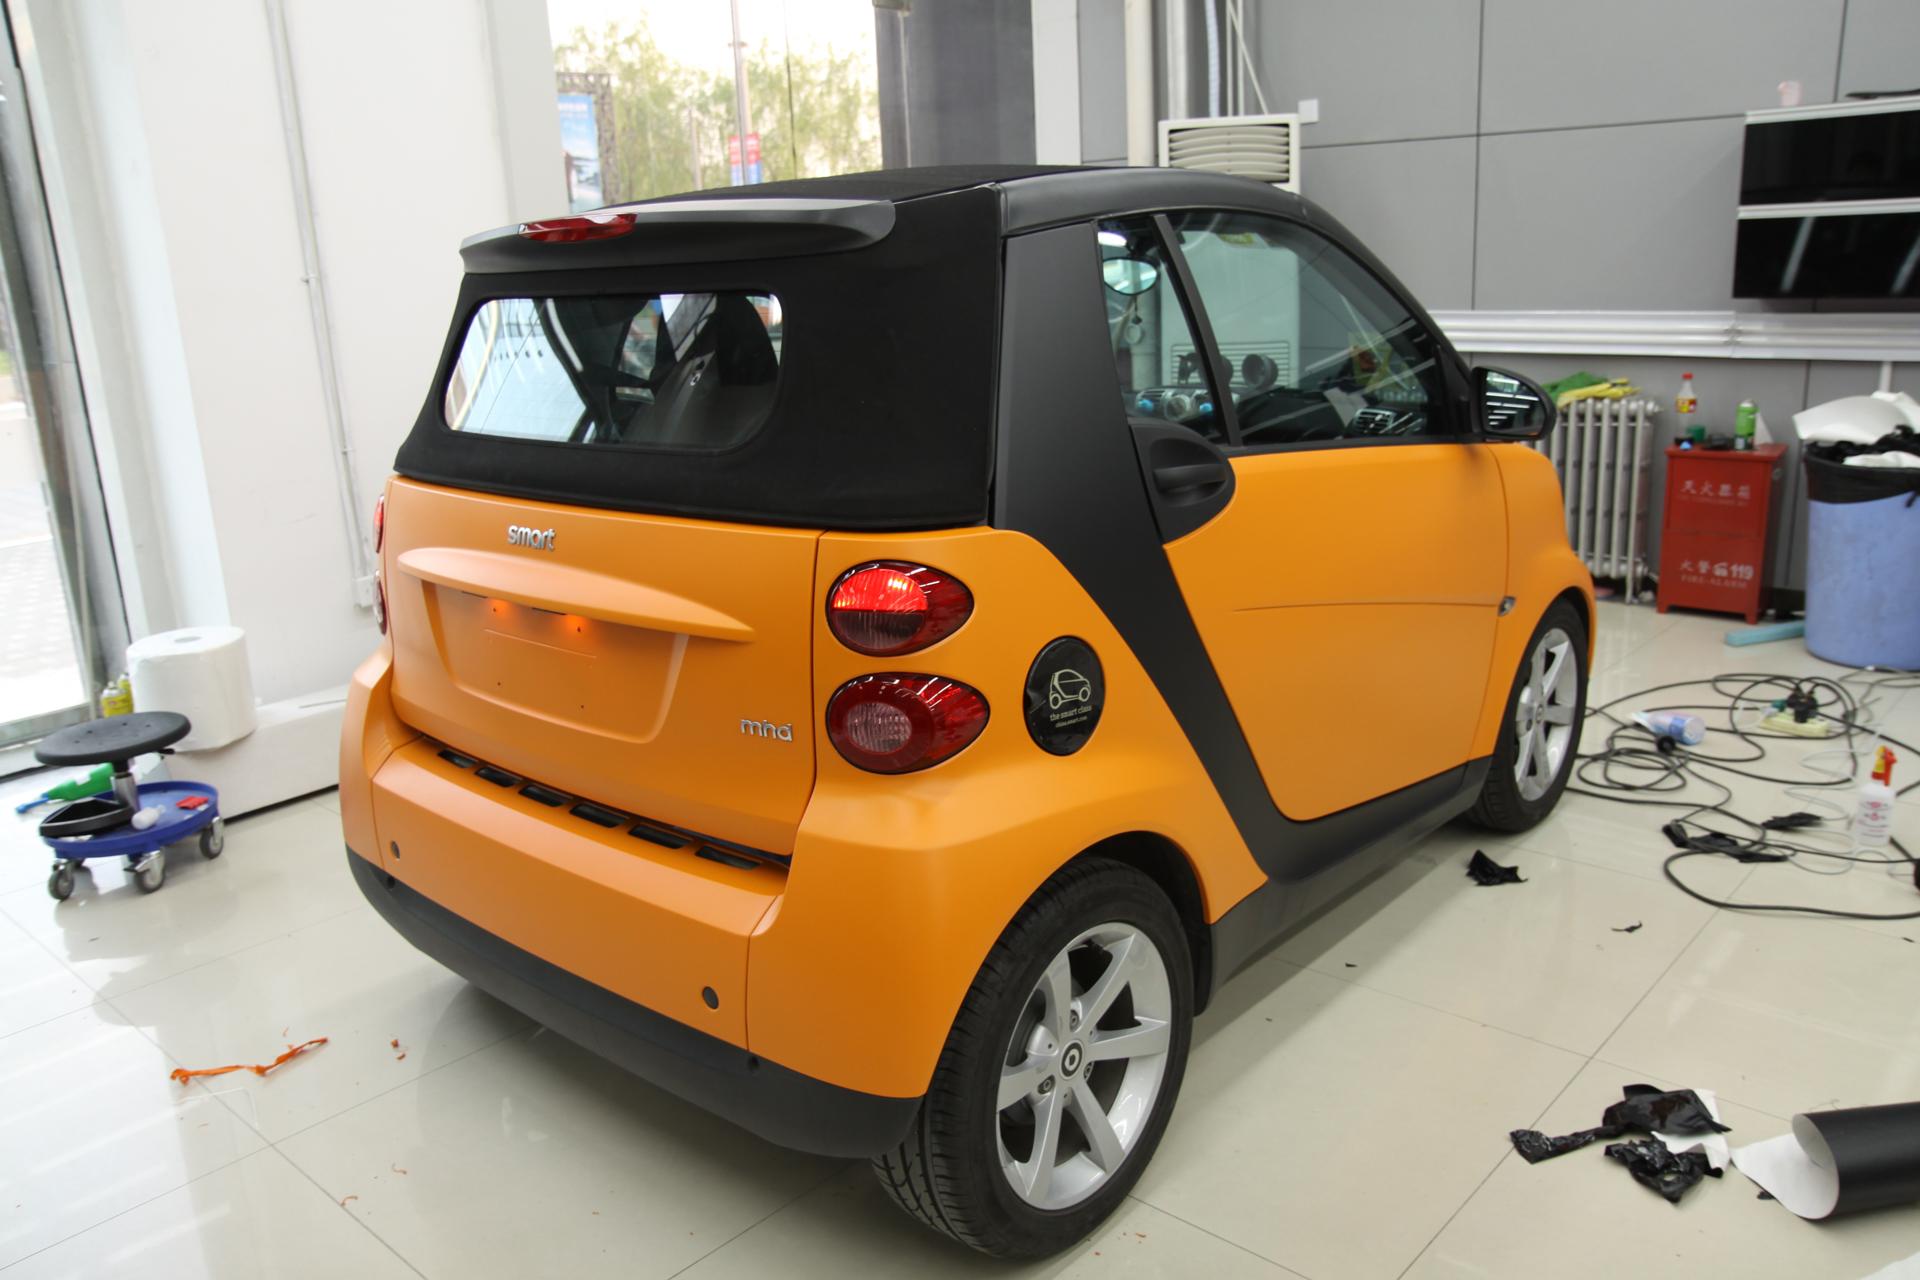 smart改装全车亚光橙贴膜